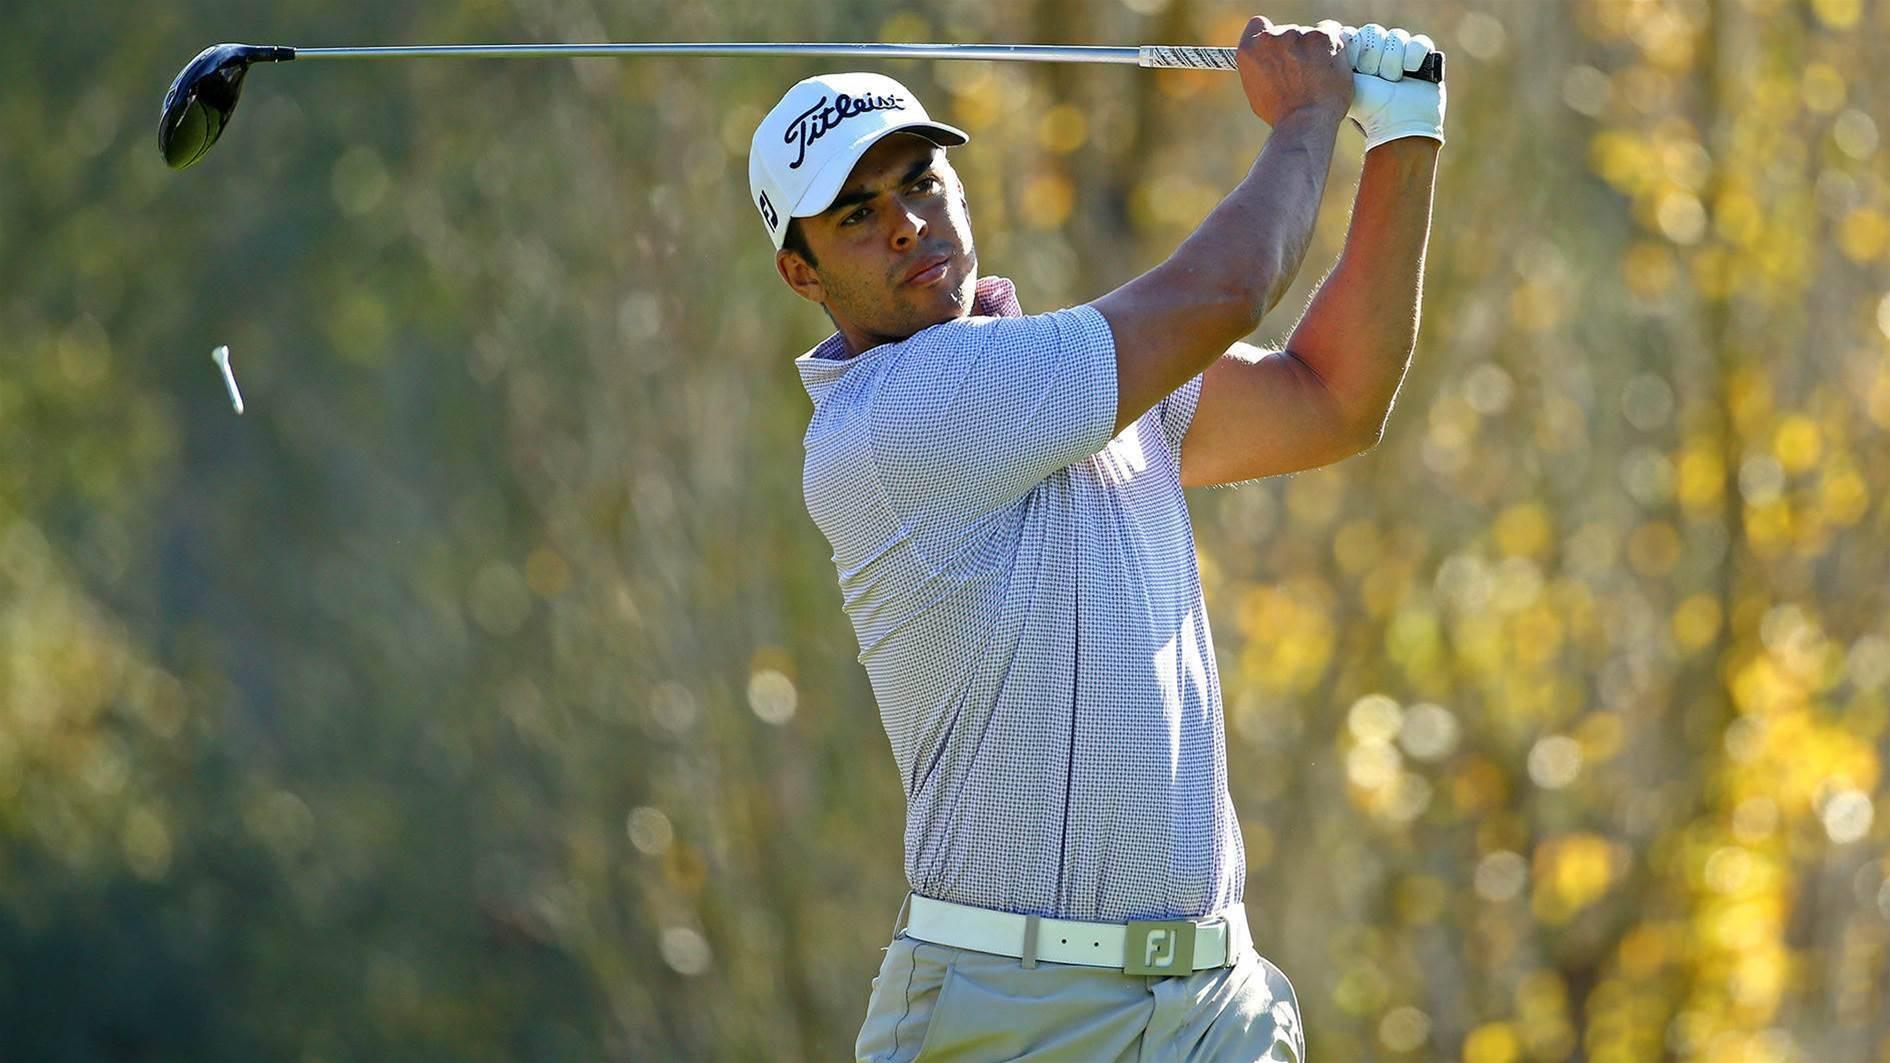 Papadatos keeps his cool to win WA PGA